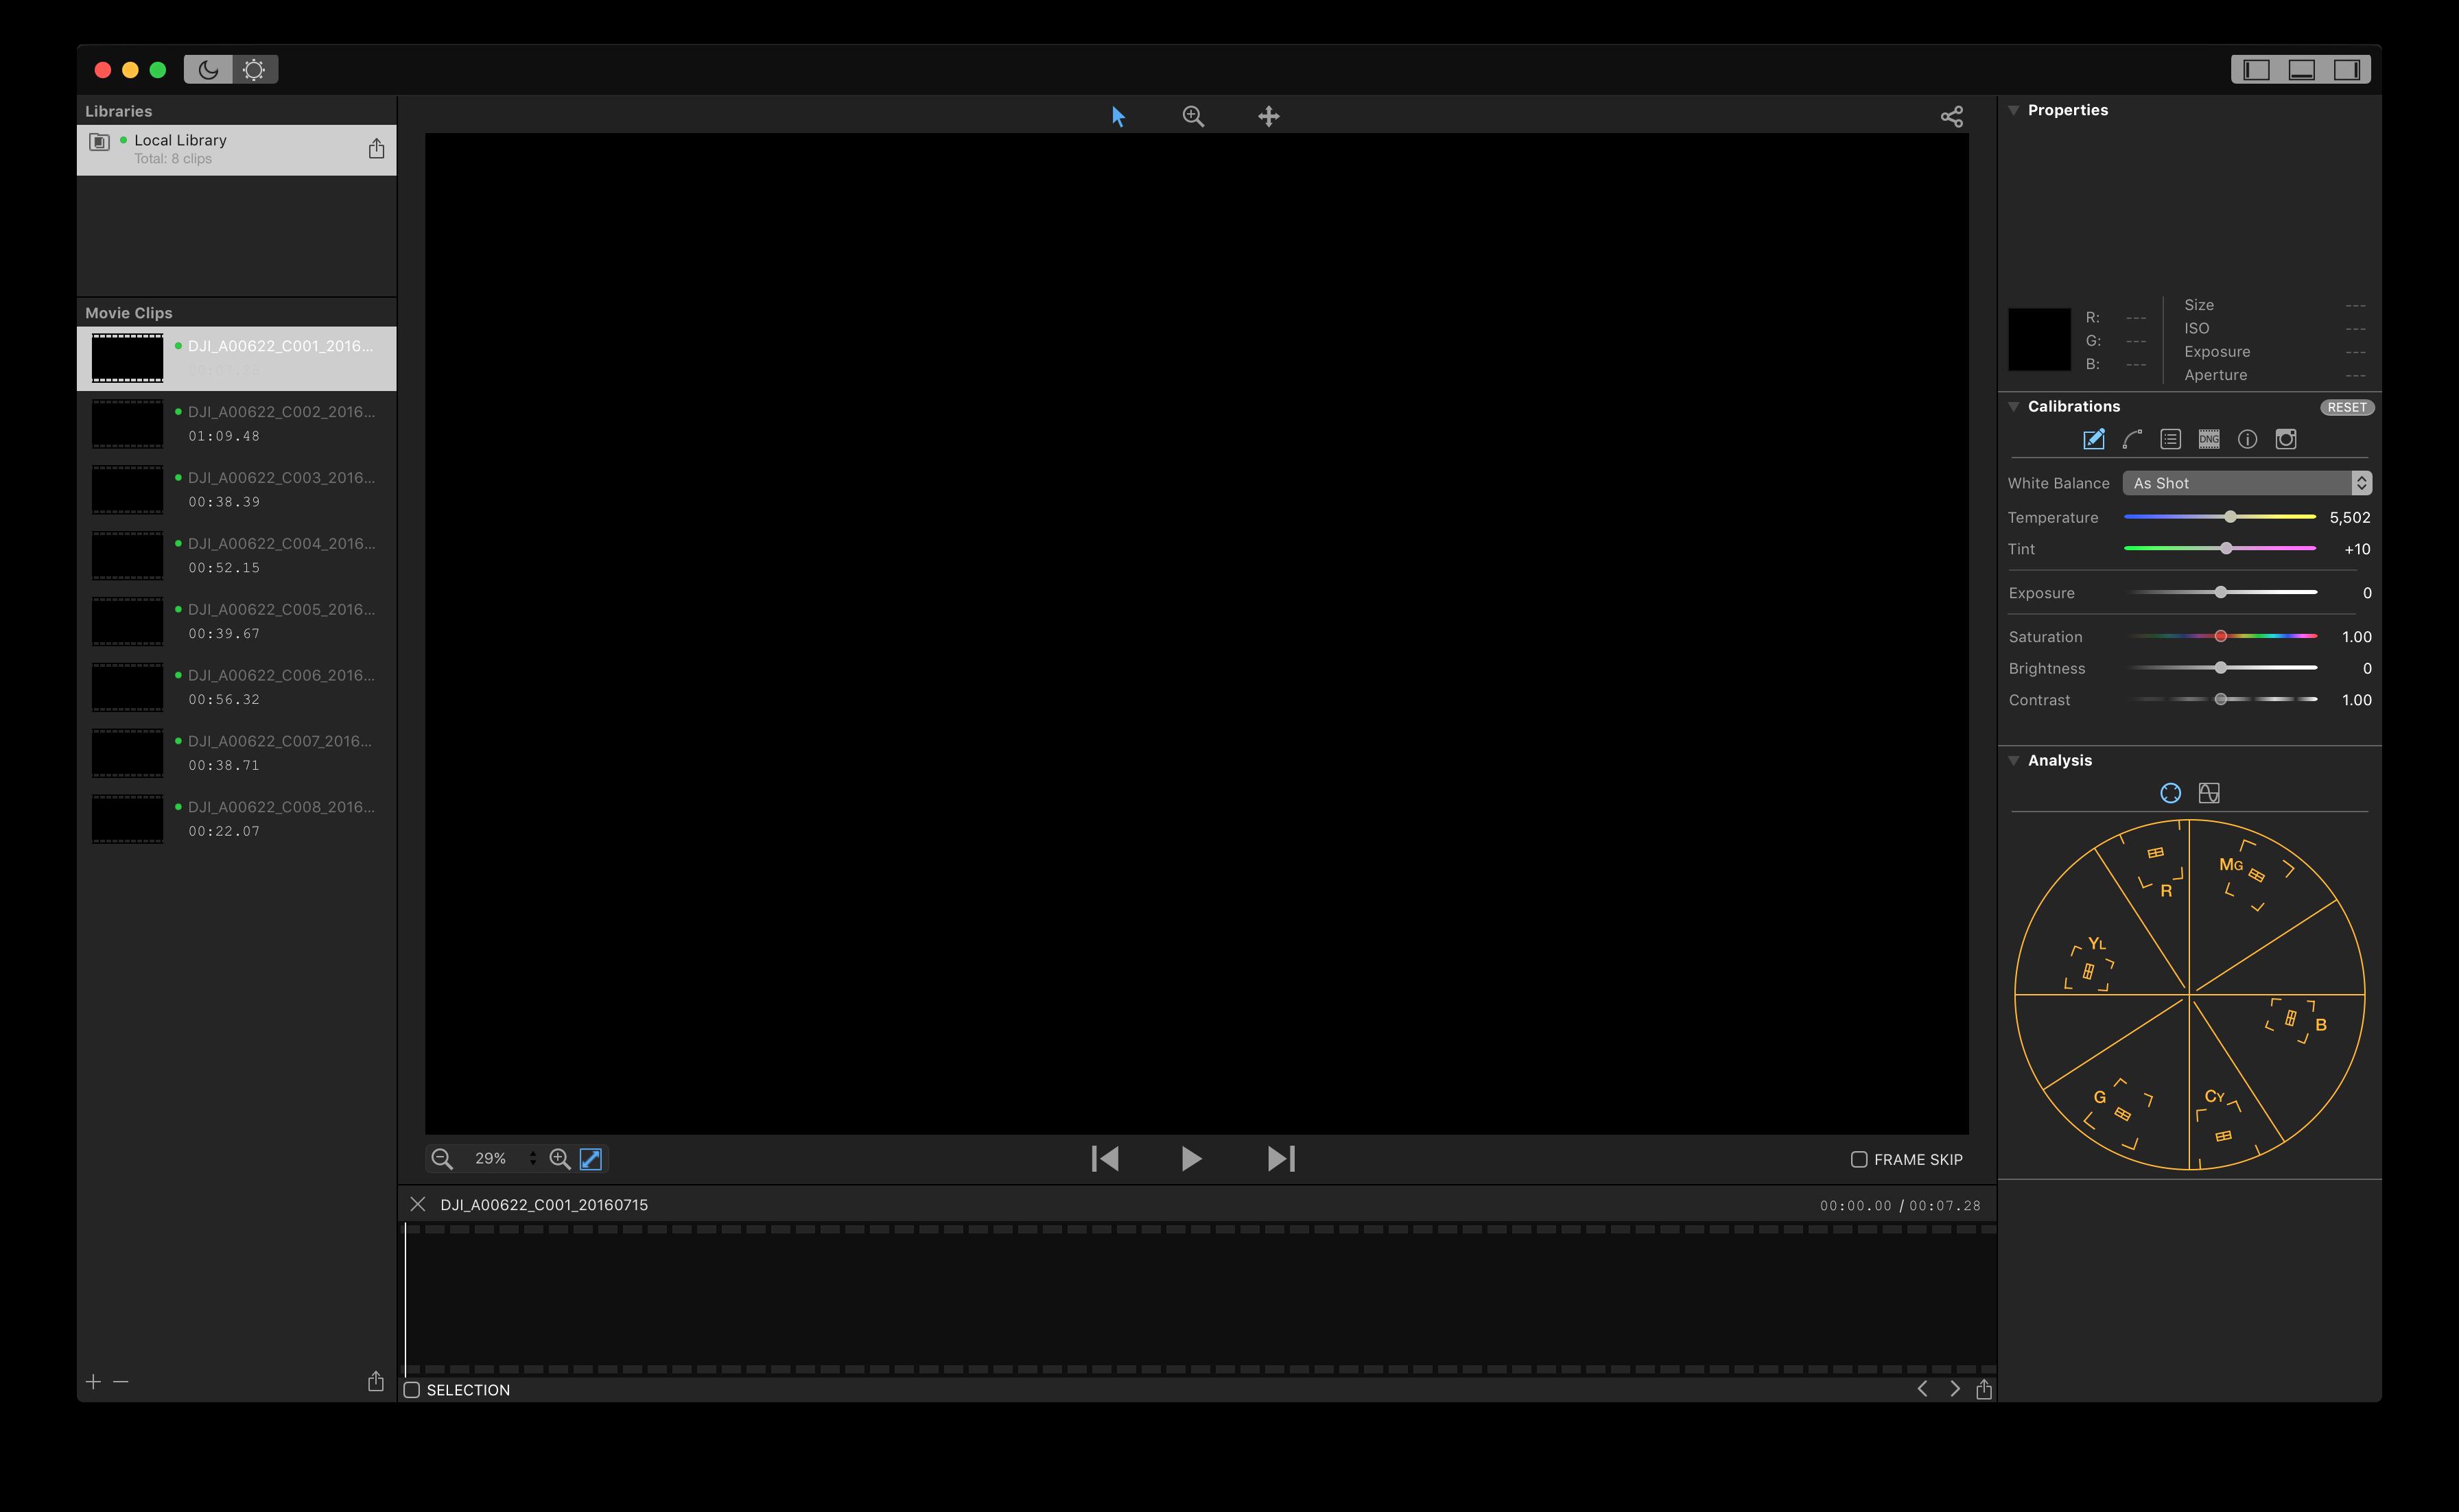 Cinelight interface